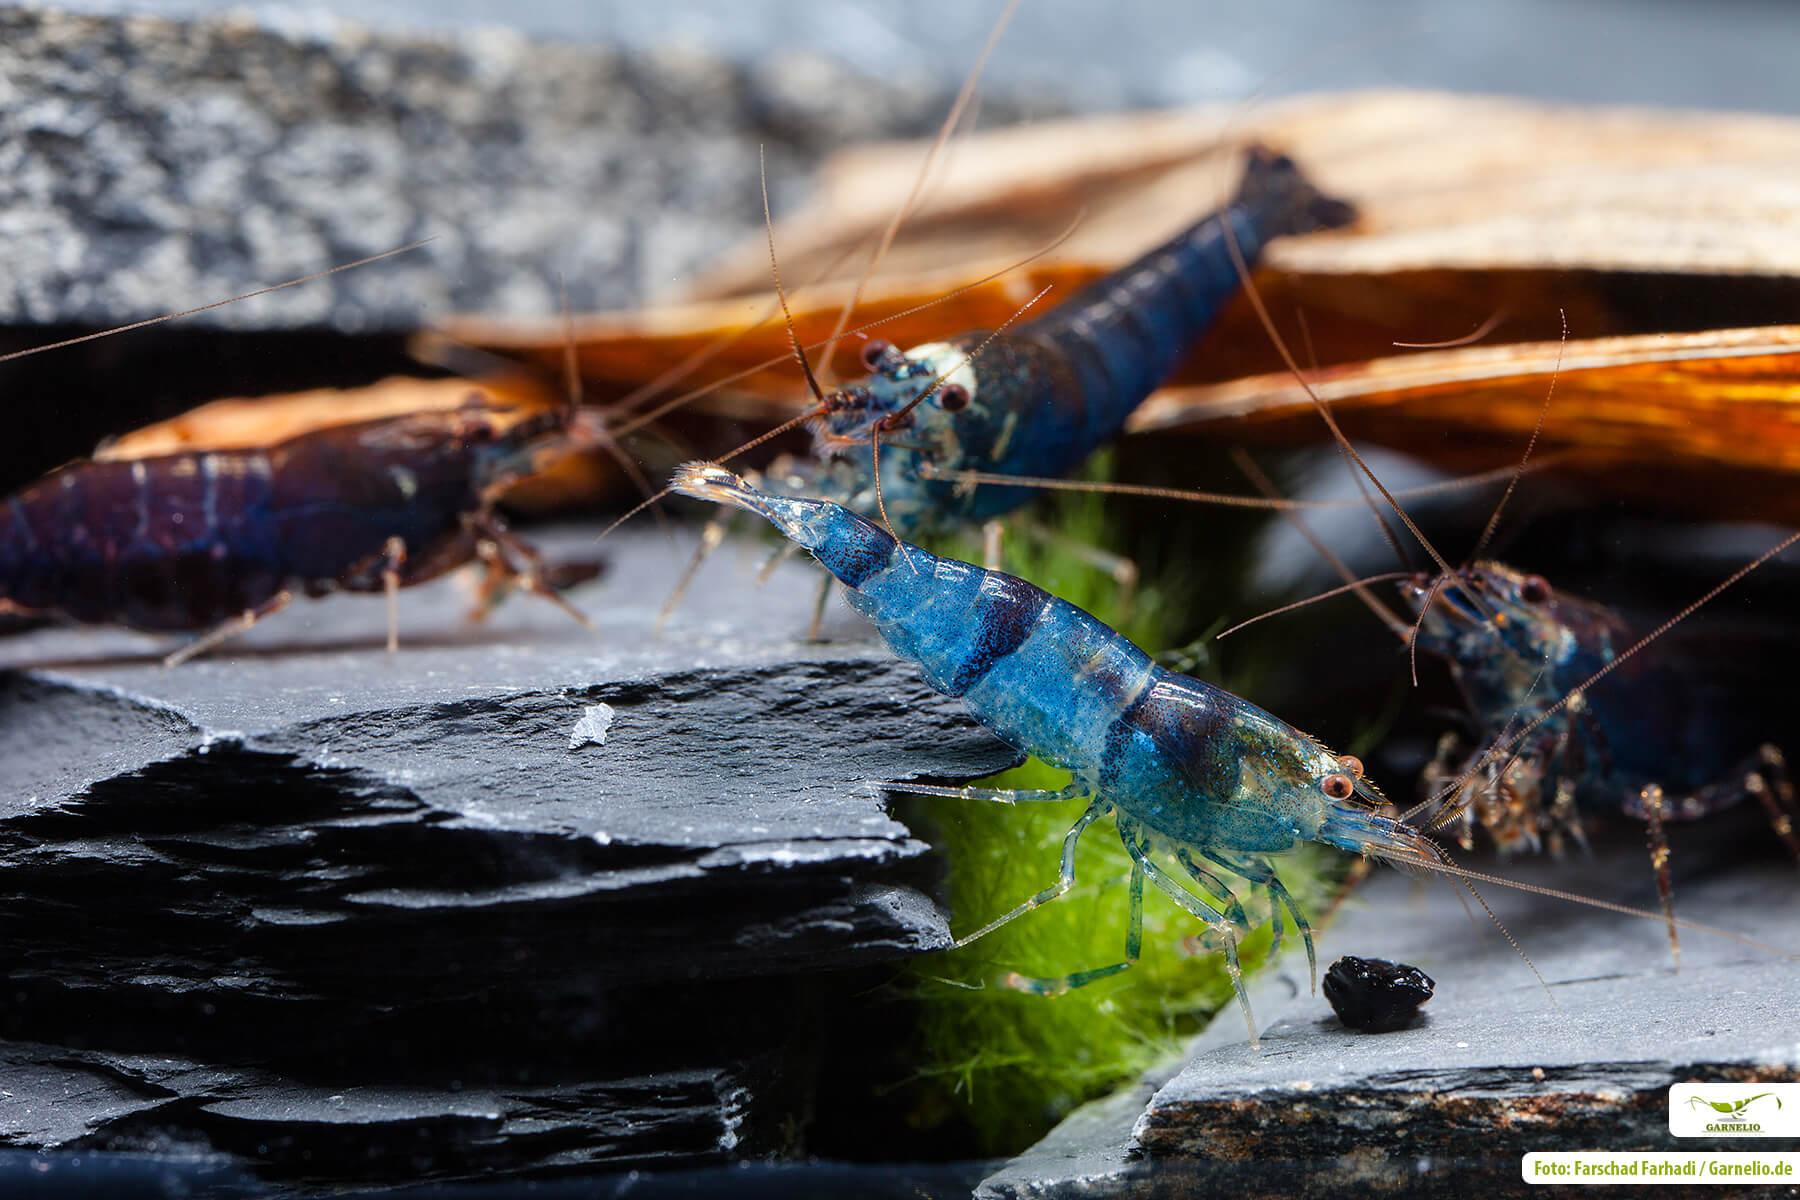 Garnelenkrankheiten bei Garnelen im Aquarium